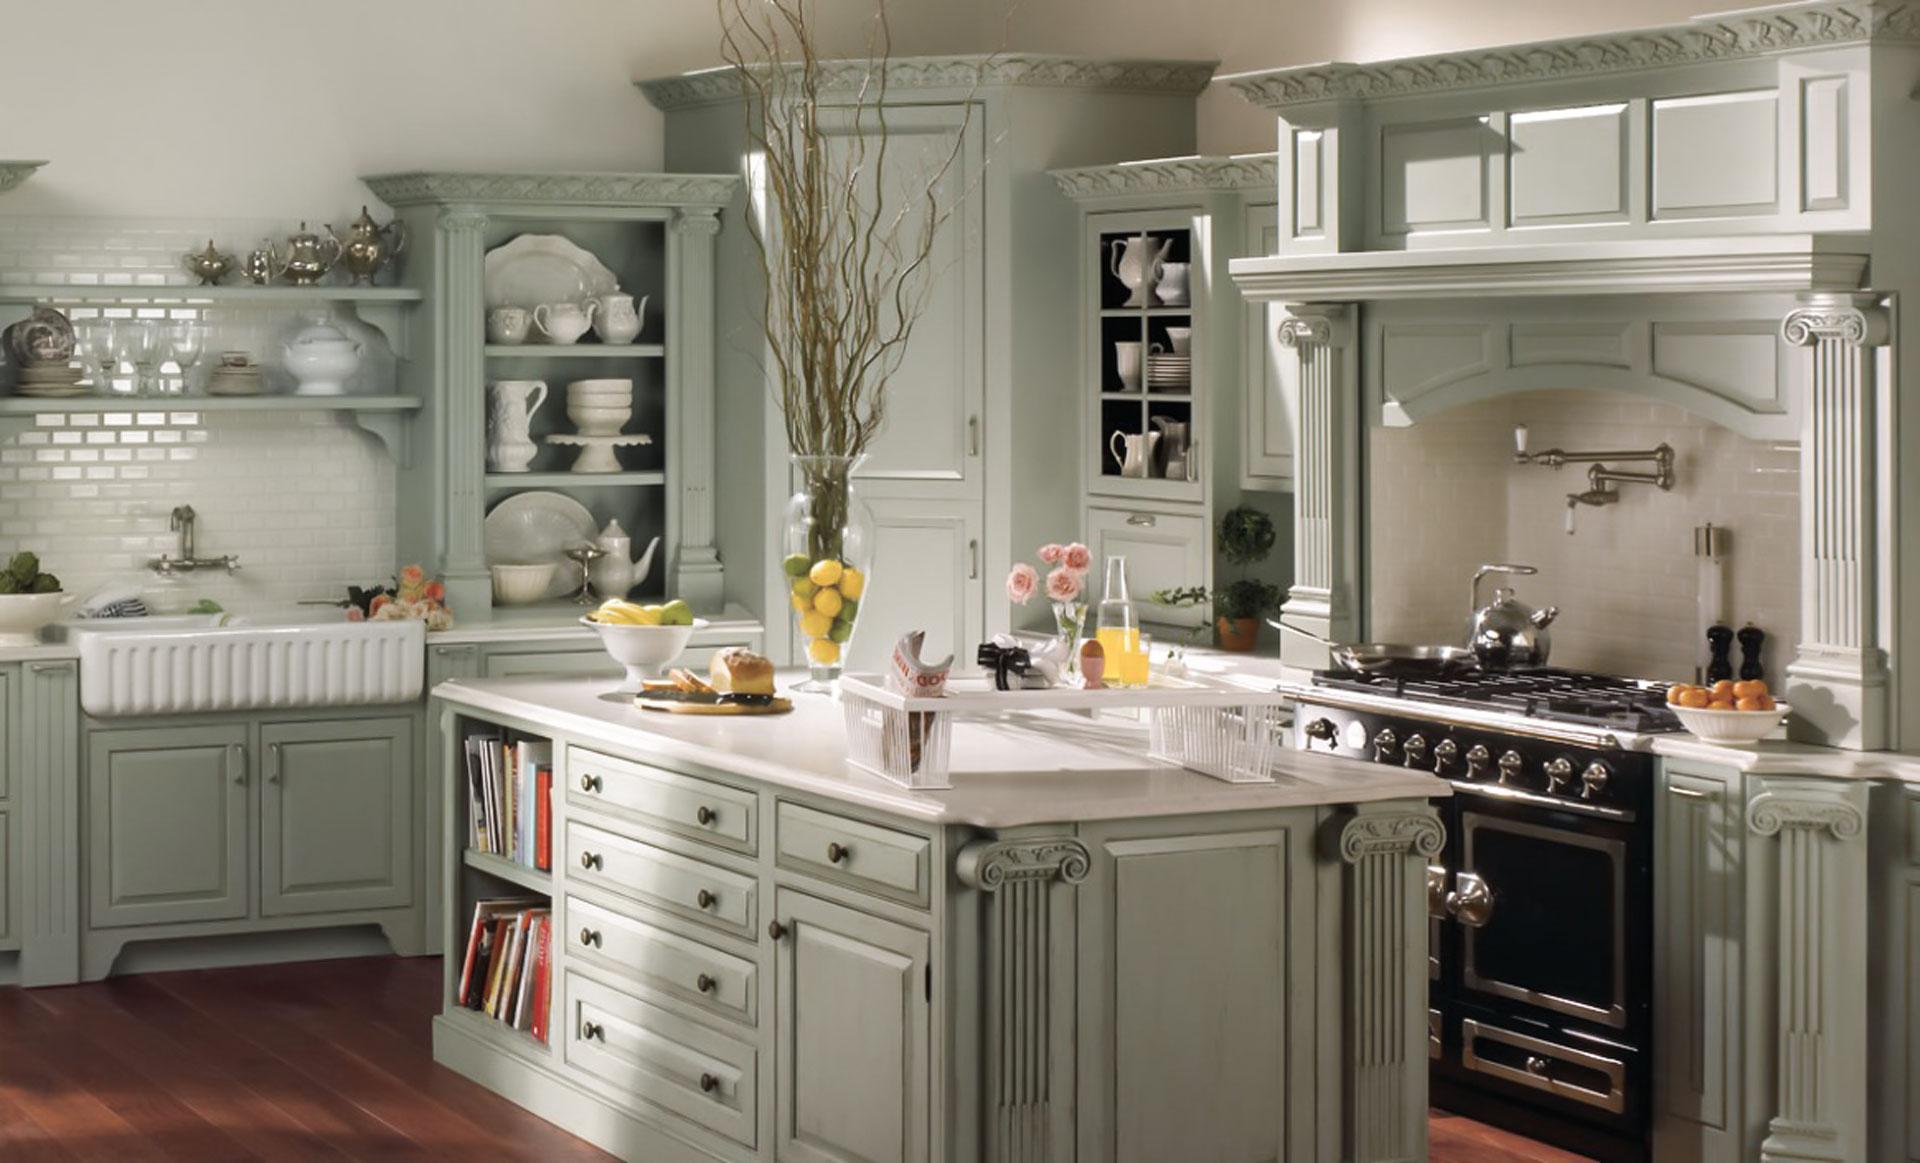 ferench english2 - تفاوت طراحی آشپزخانه فرانسوی با انگلیس